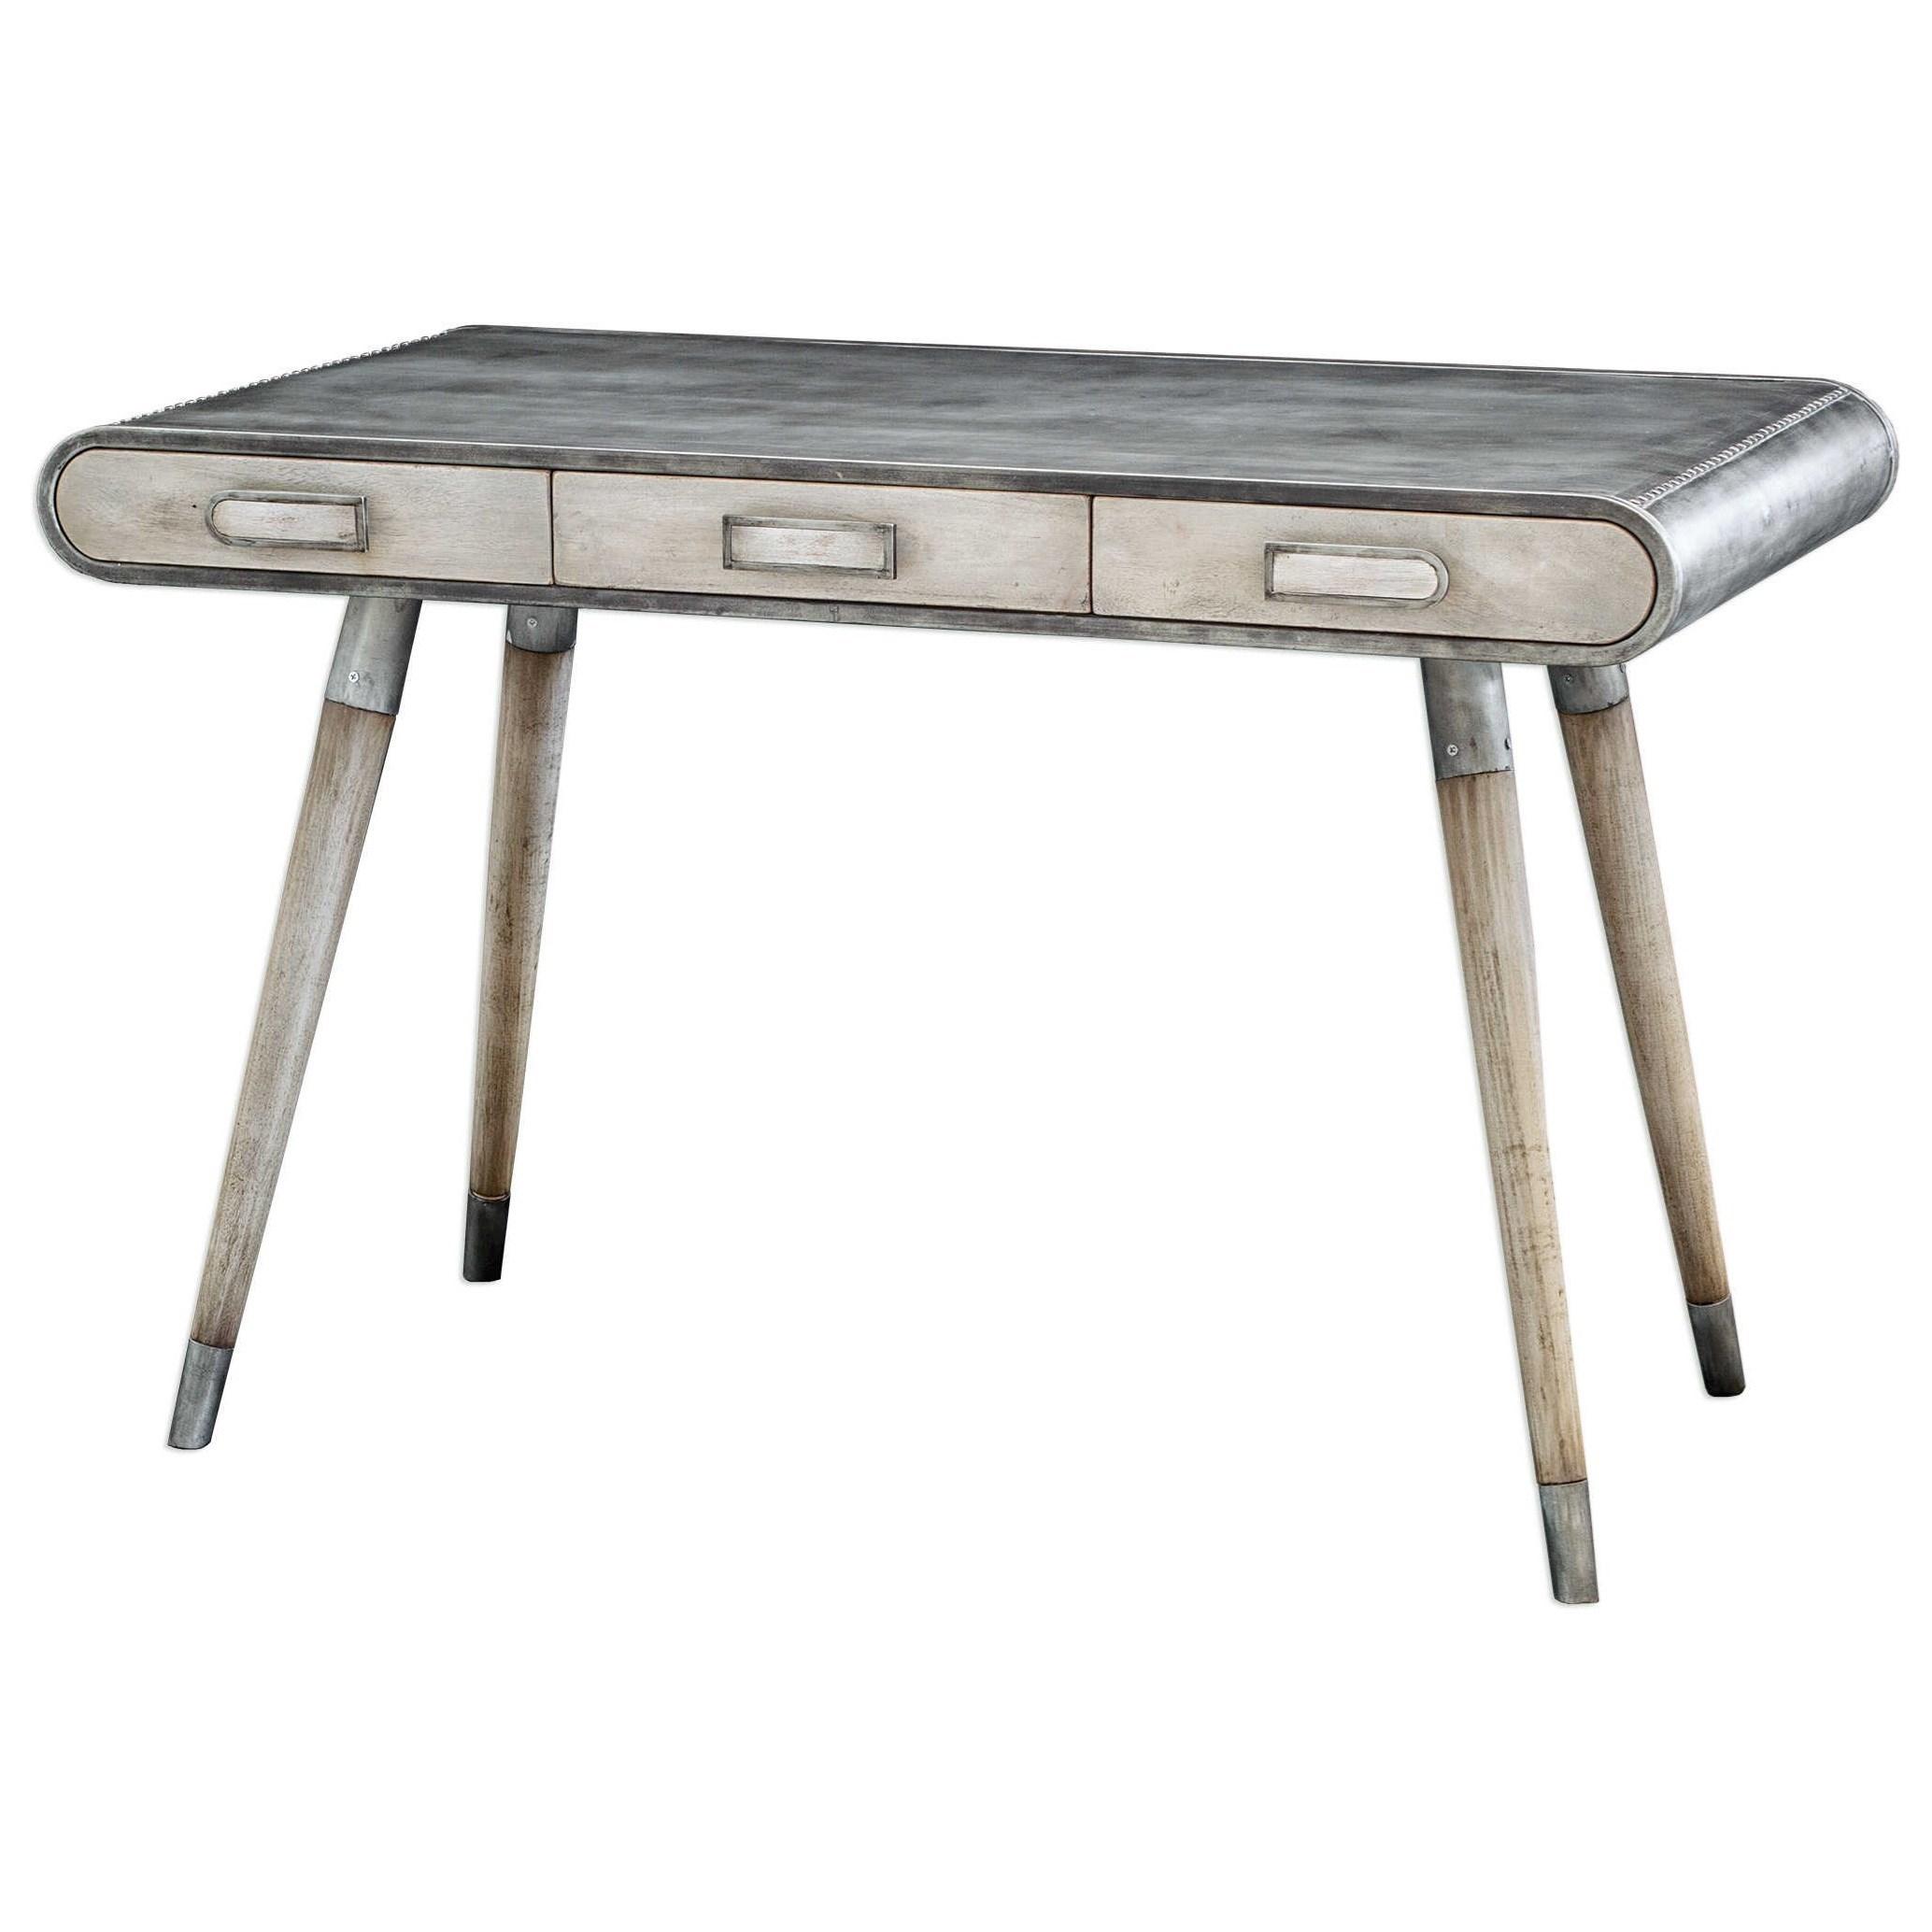 Accent Furniture Locklear Retro Aviator Writing Desk by Uttermost at Michael Alan Furniture & Design